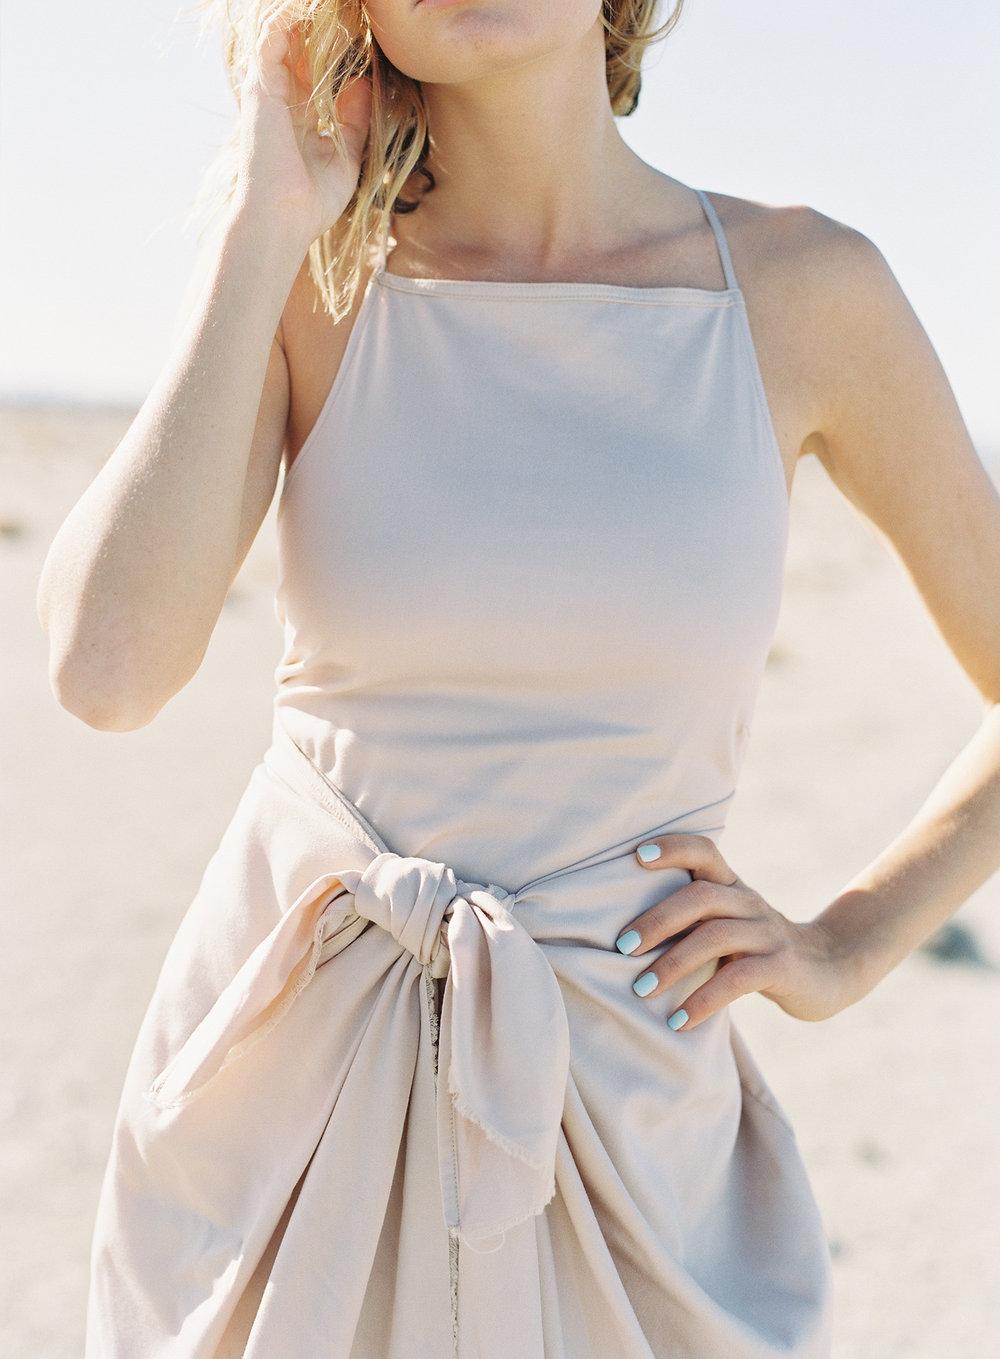 desert-fashion-6.jpg